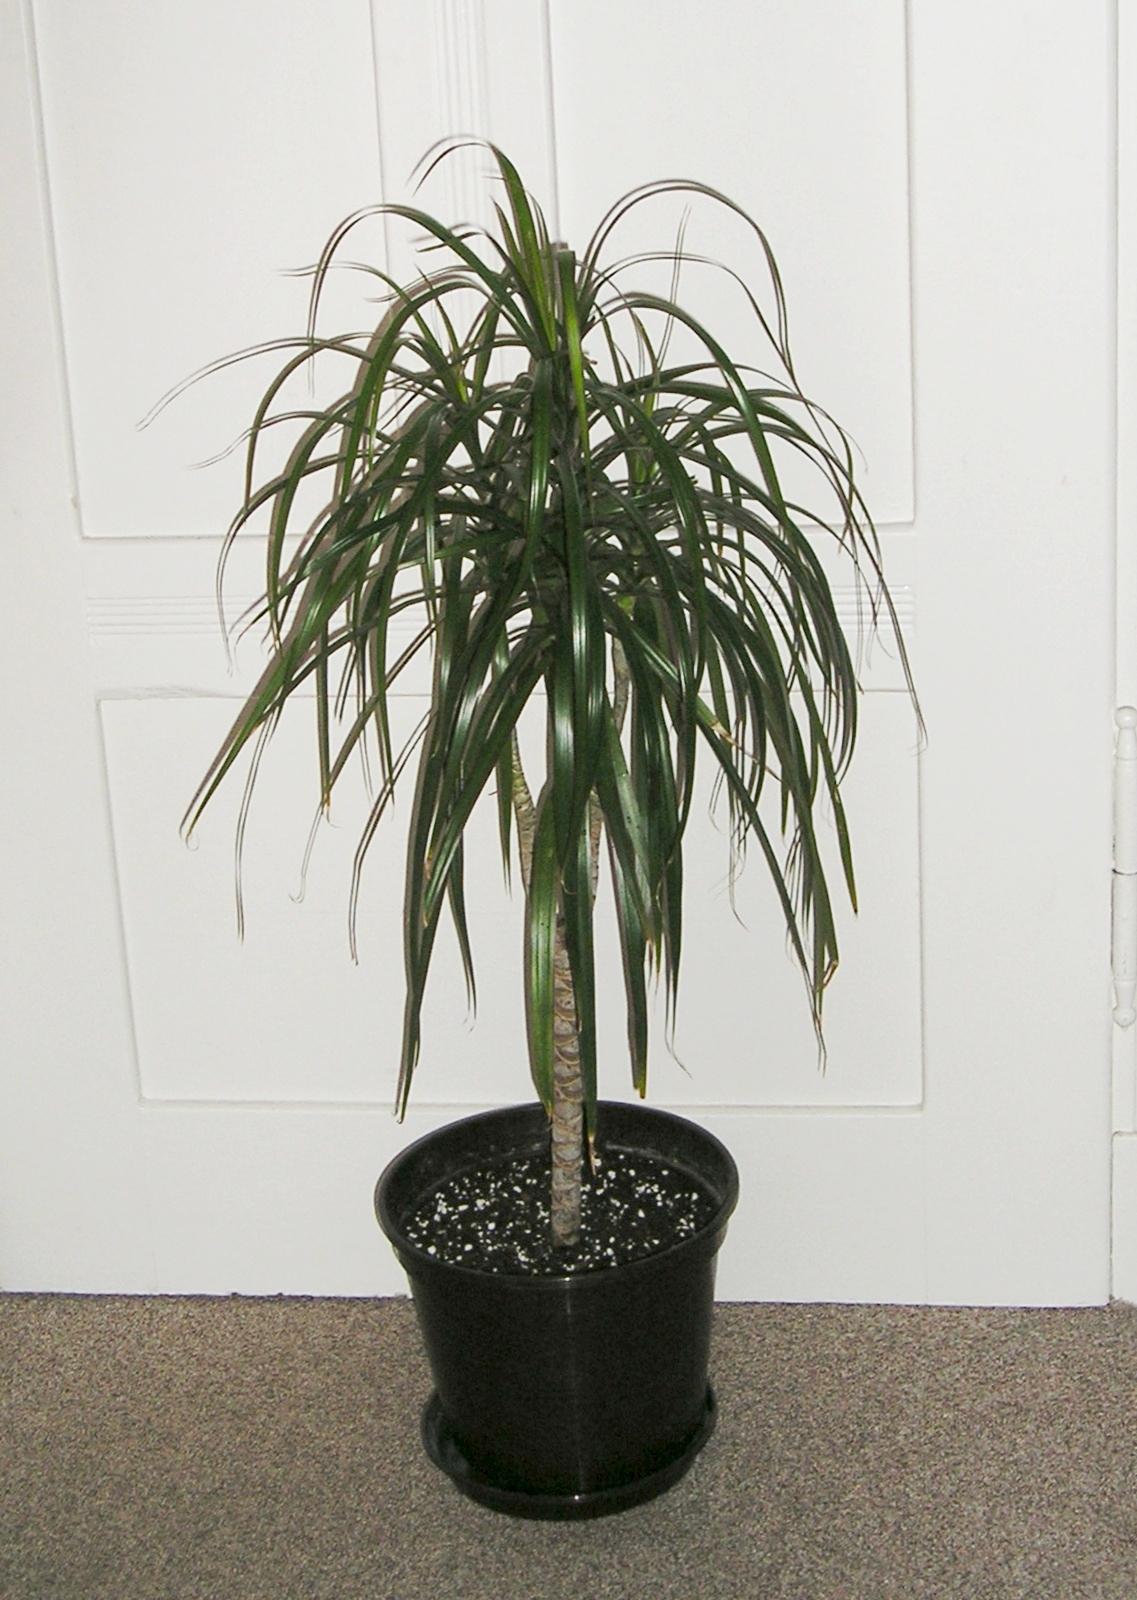 drachenbaum dracaena marginata bicolor flickr photo sharing. Black Bedroom Furniture Sets. Home Design Ideas